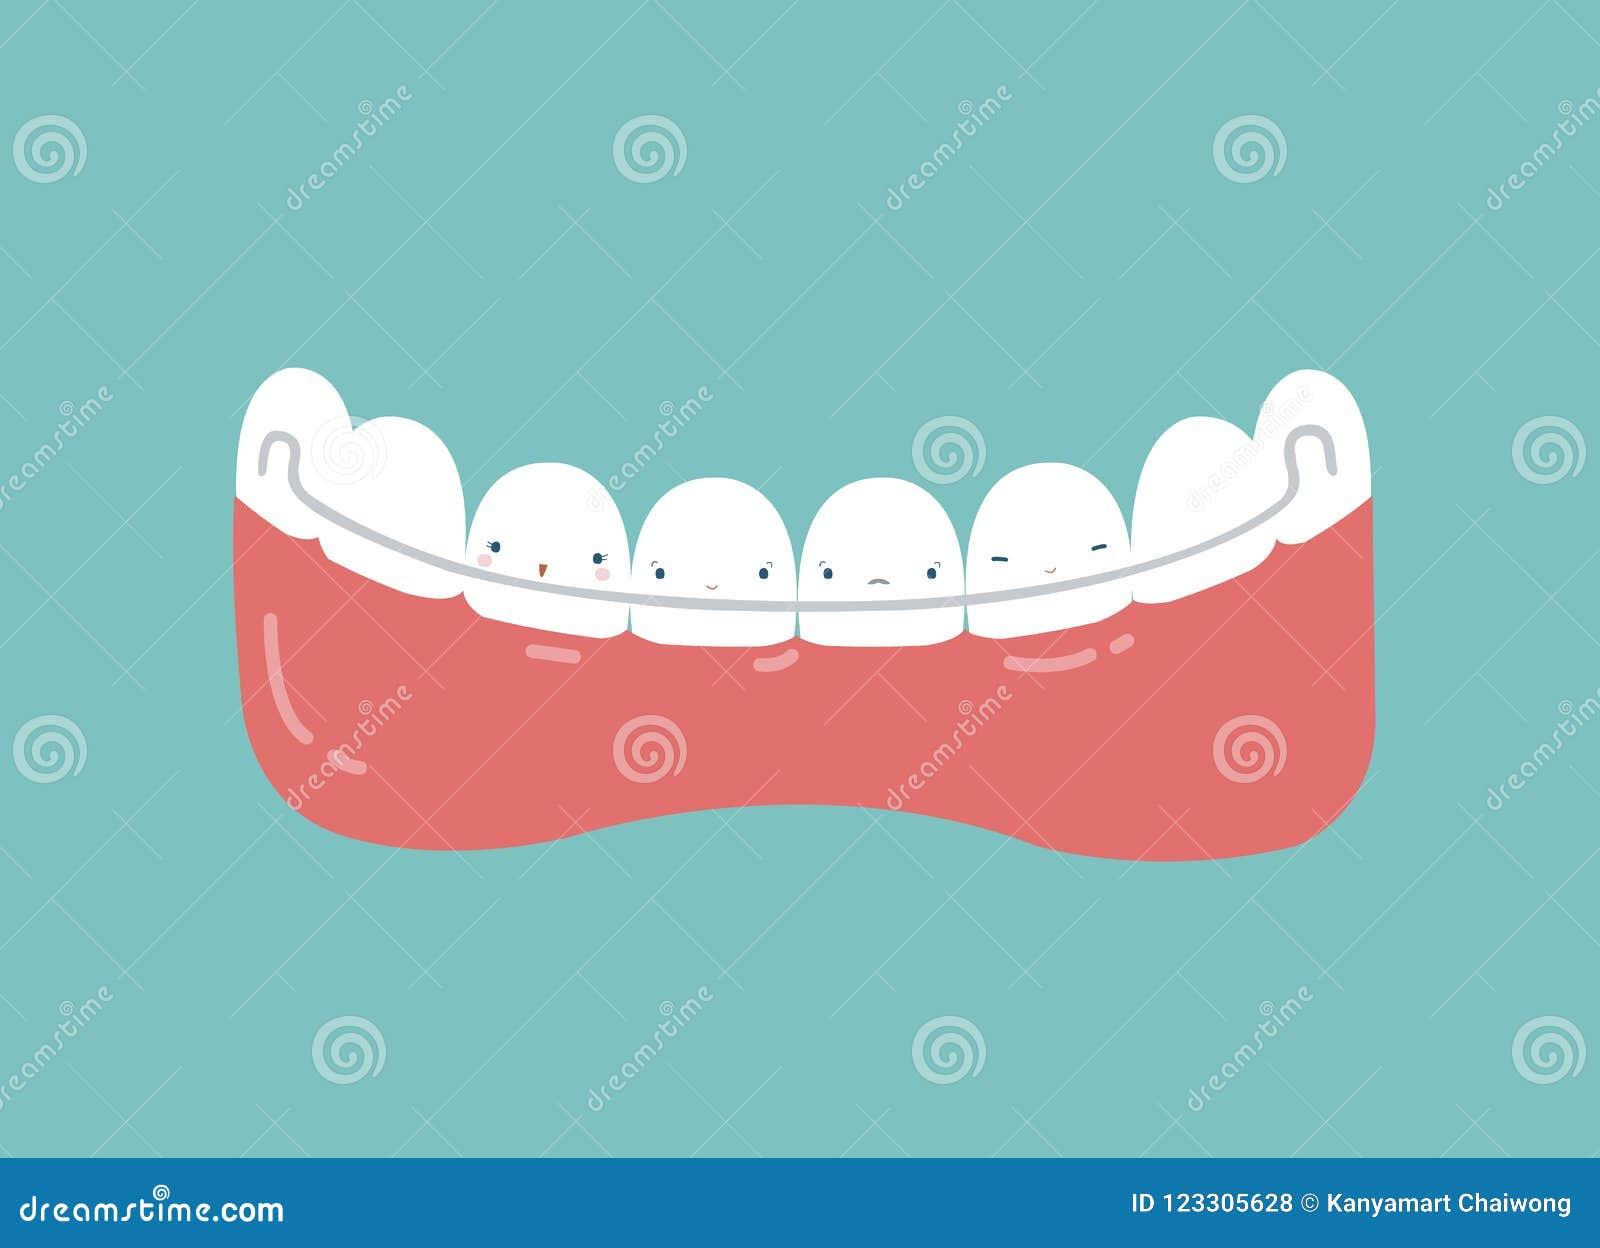 Retainer Teeth, Dental Concept Stock Vector - Illustration